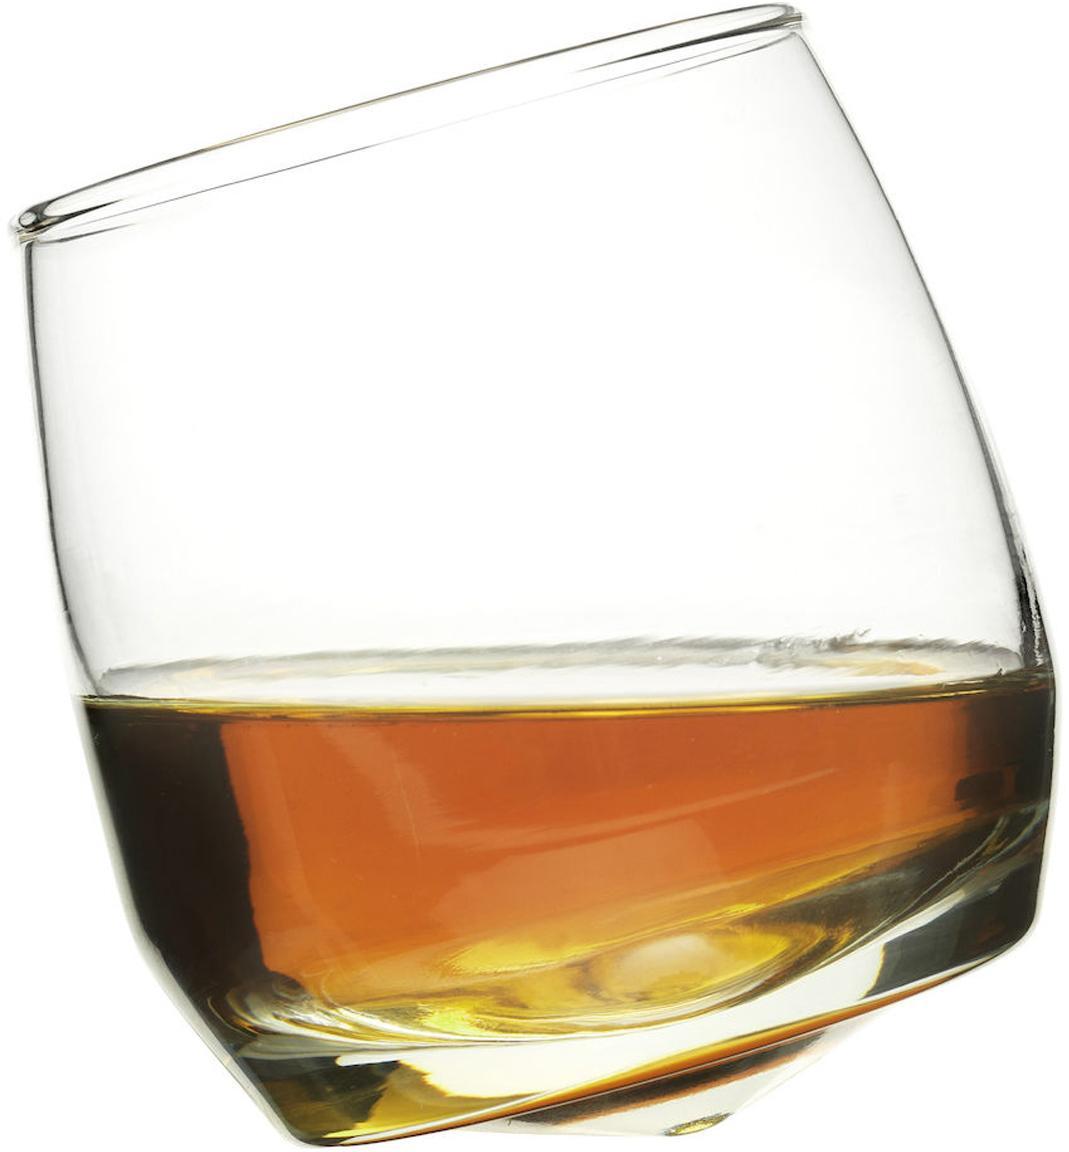 Wiskeyglazen Rocking, 6 stuks, Mondgeblazen glas, Transparant, Ø 7 x H 9 cm